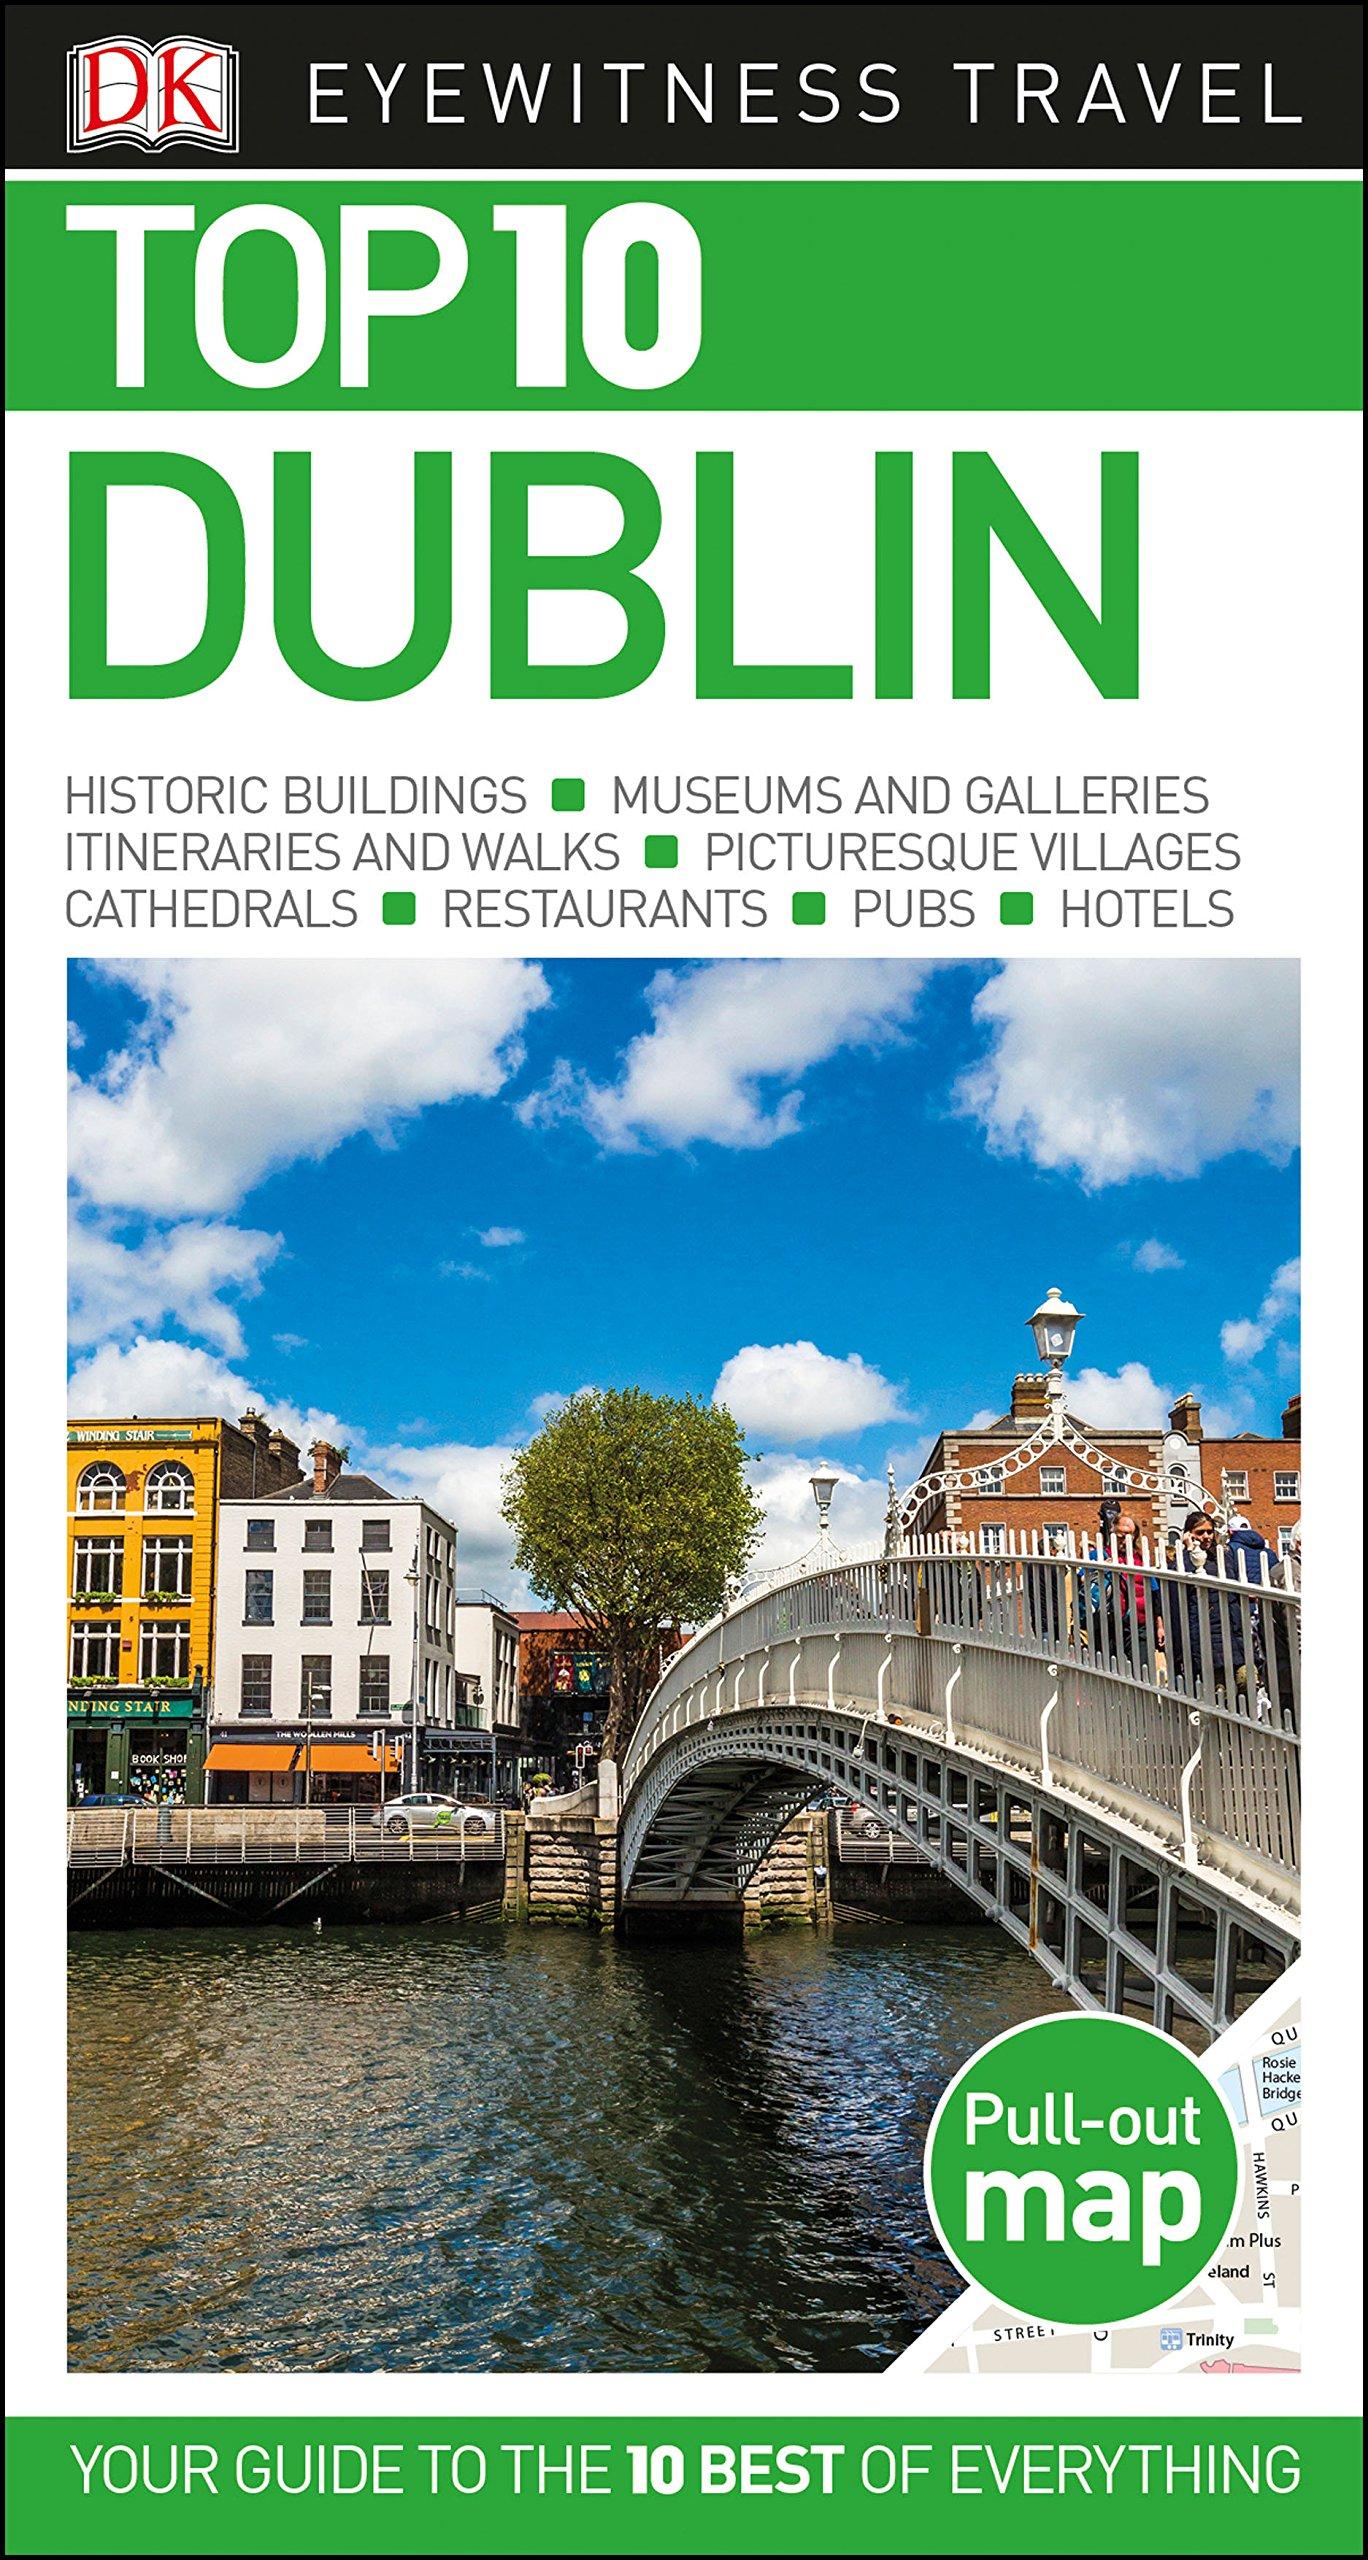 Top 10 Dublin (DK Eyewitness Travel Guide): DK Travel: 9781465467812:  Amazon.com: Books